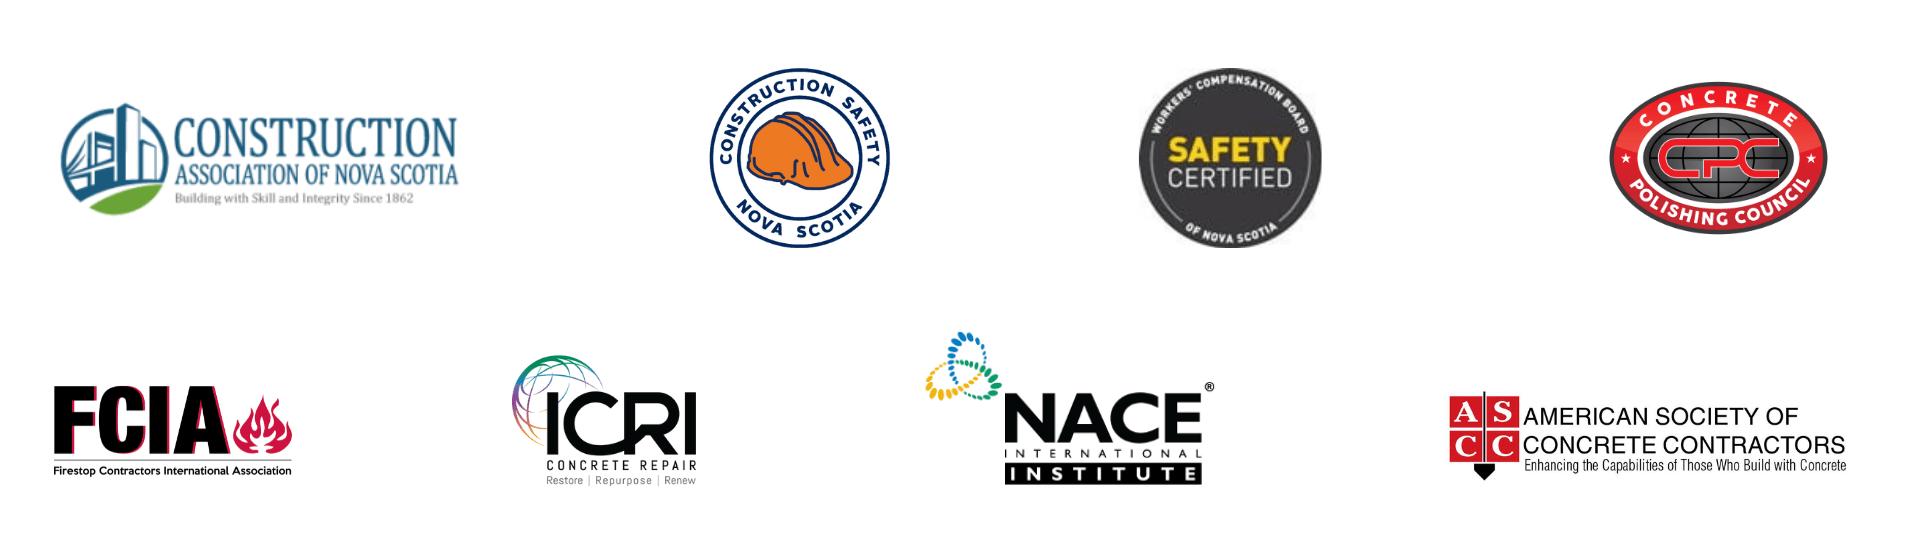 ABR Association Logos